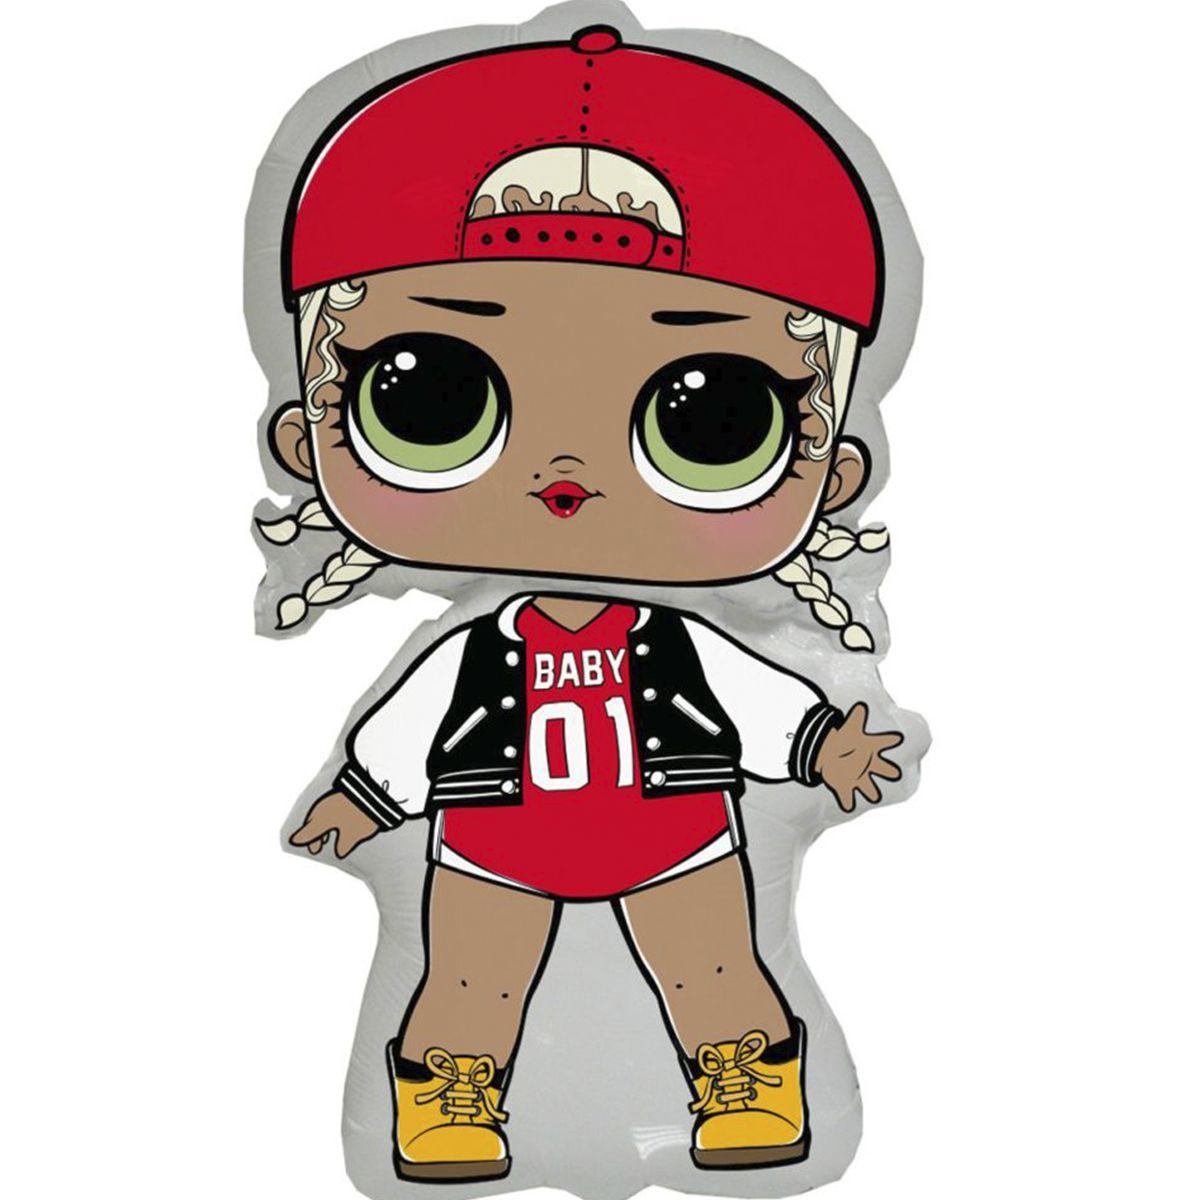 Фольгированный шар большой фигурный Кукла Лол Эм Си Сваг Lol Mc Swag